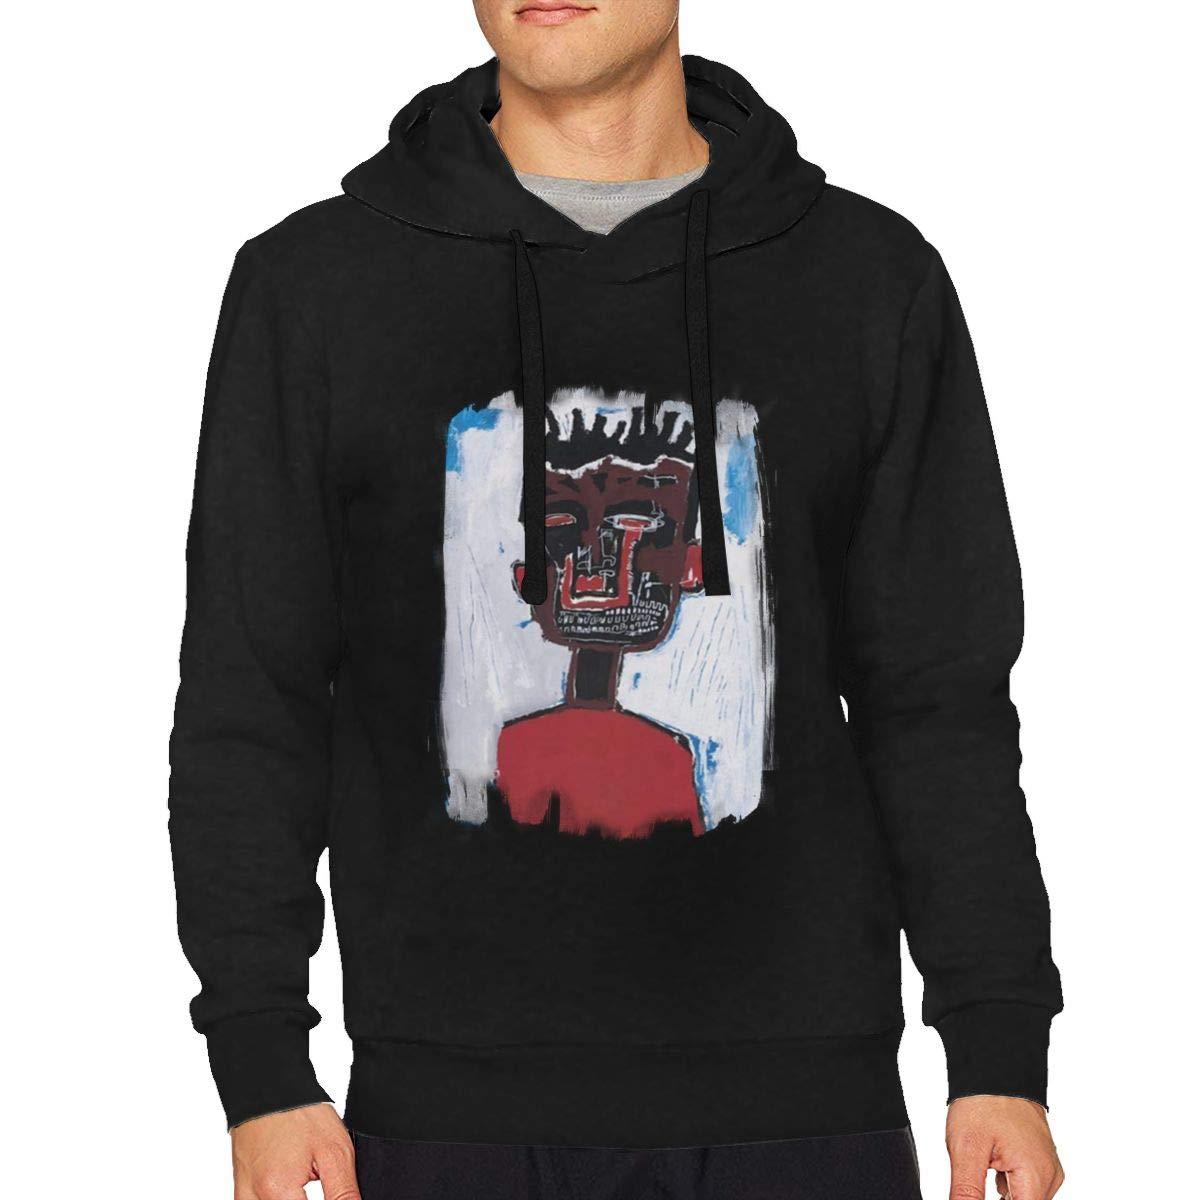 Dfgfatg55 Jean Michel Basquiat S Teens Adult Hooded Shirts